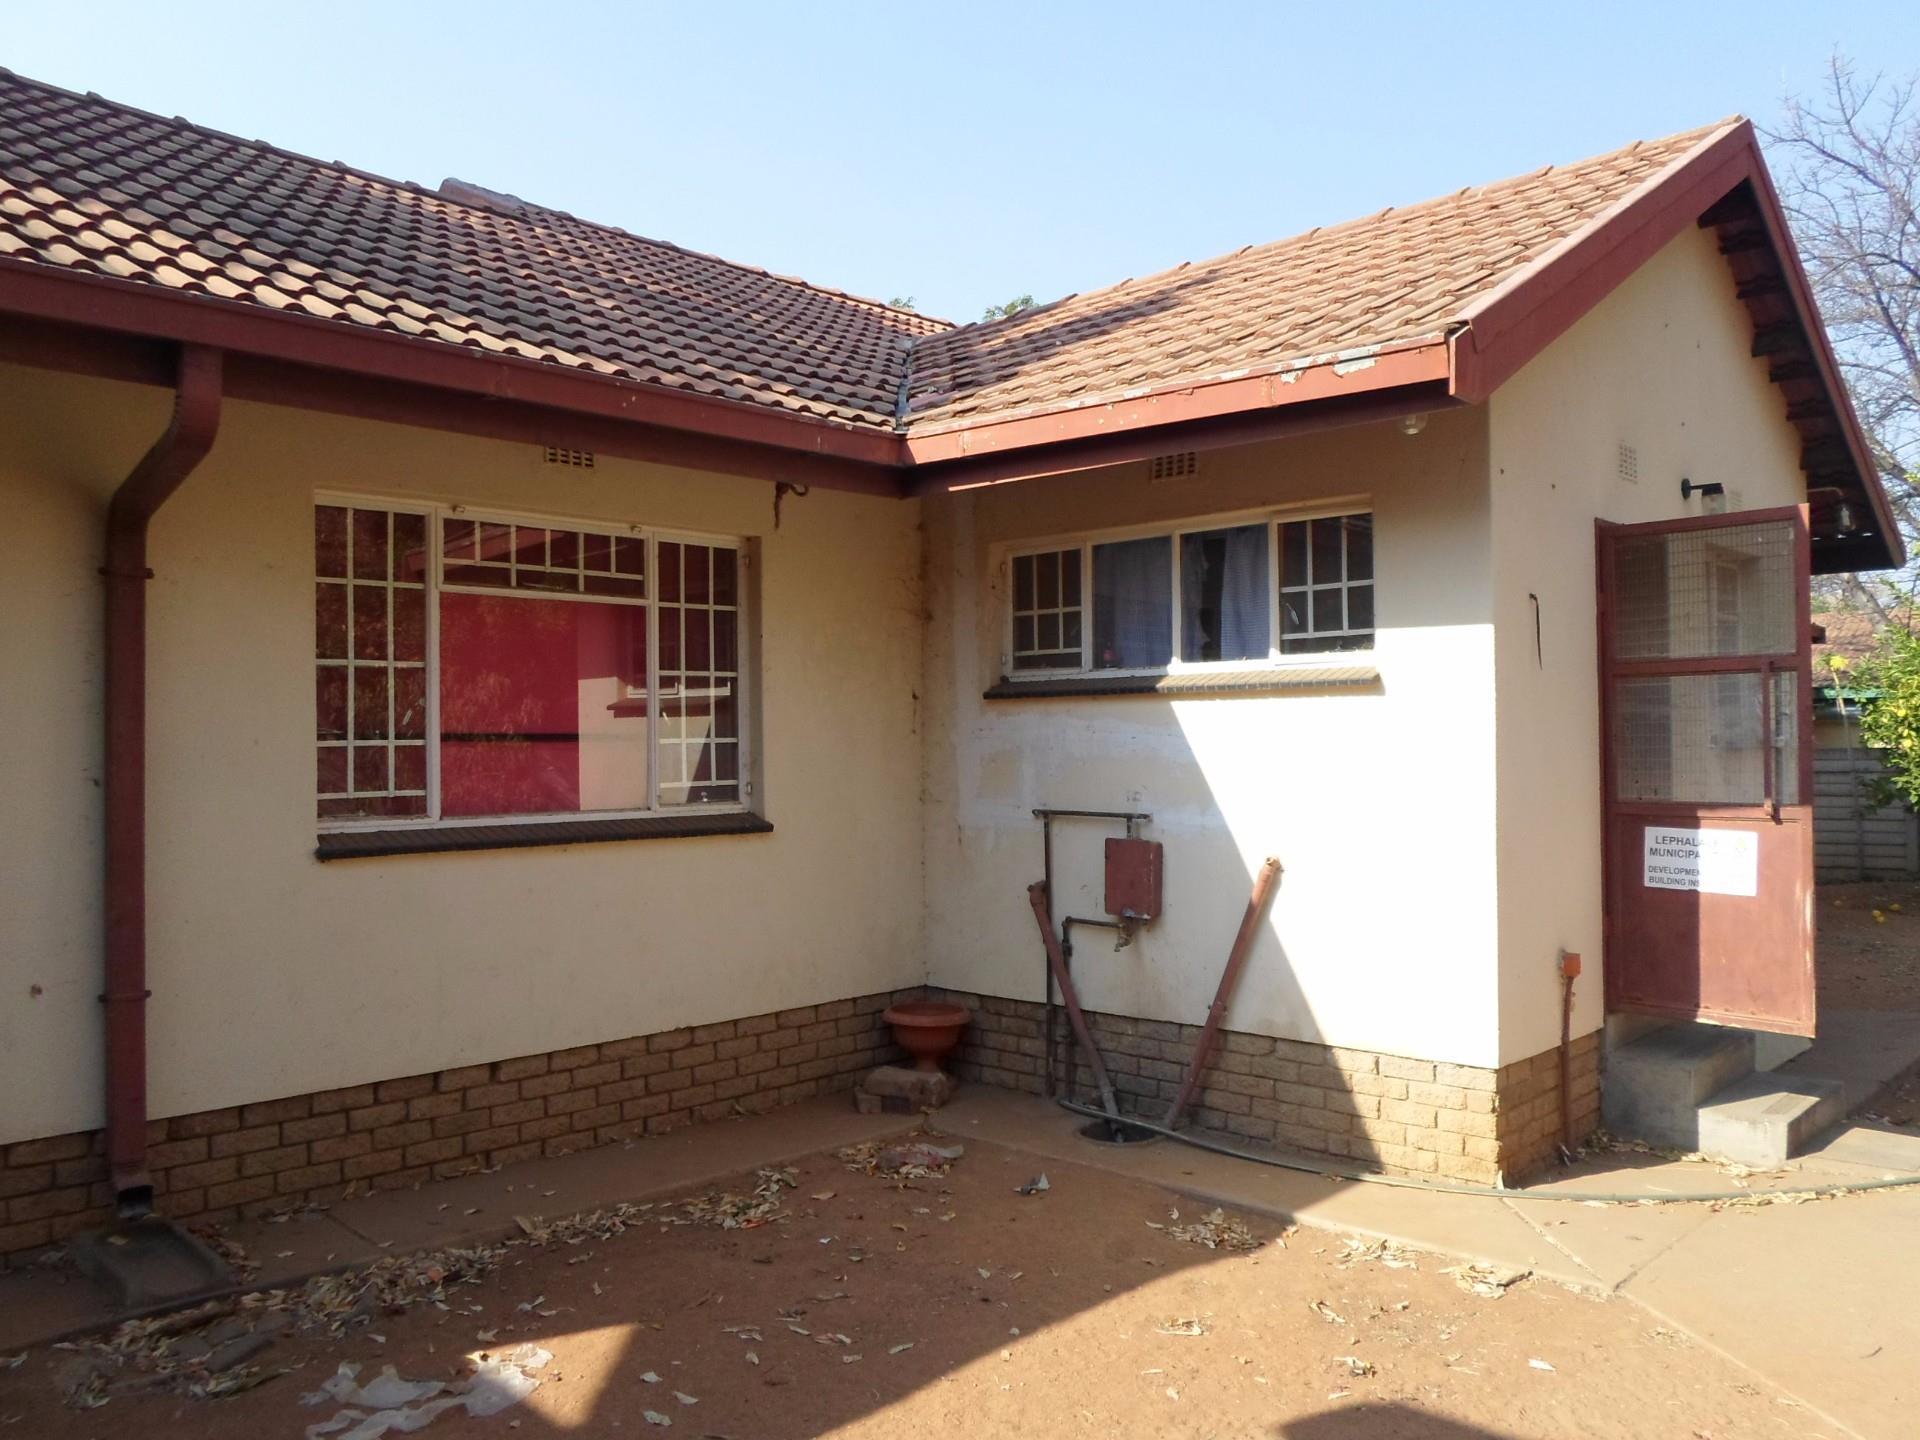 3 Bedroom House To Rent in Onverwacht